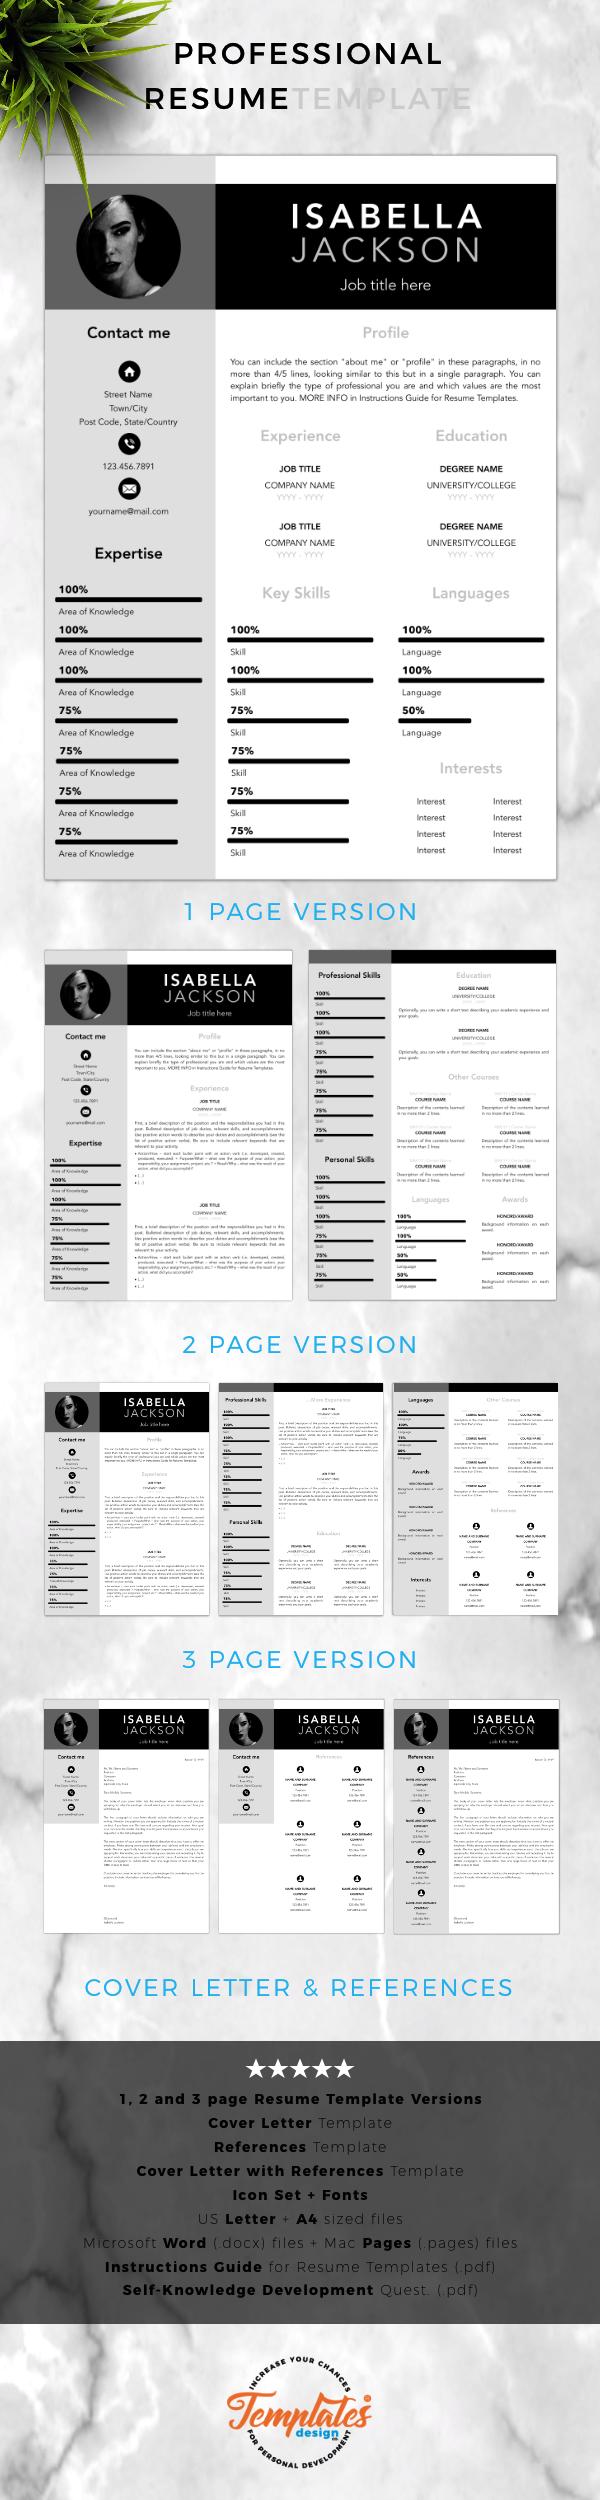 Bonus Letter Template Simple Resume Template  Cv Template  Professional Resume Template .